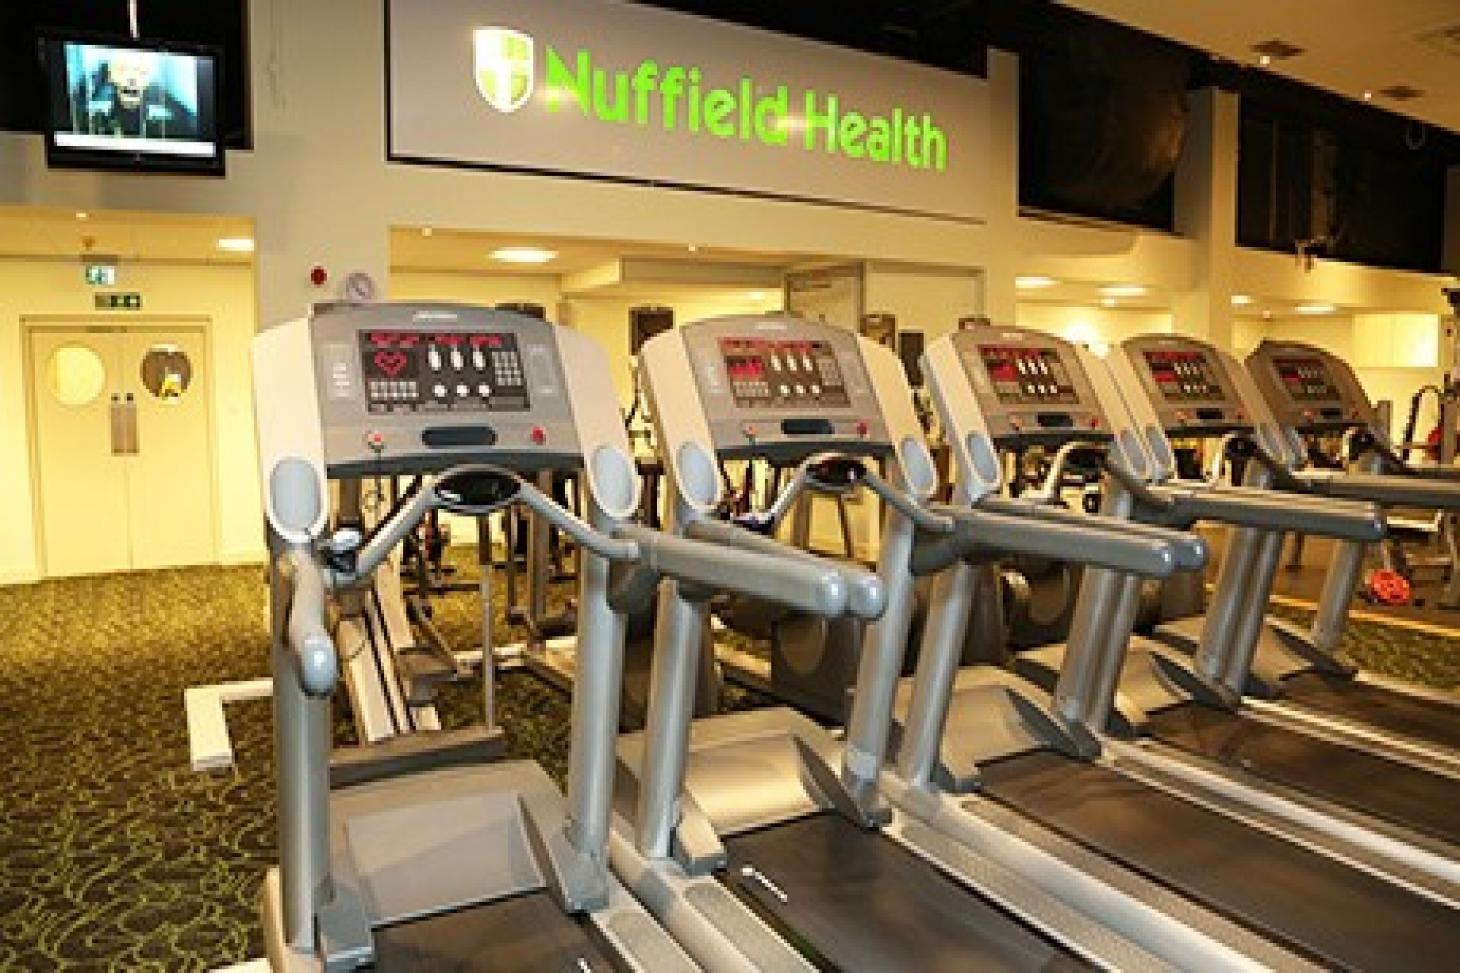 Nuffield Health Fitness & Wellbeing Bloomsbury Gym gym